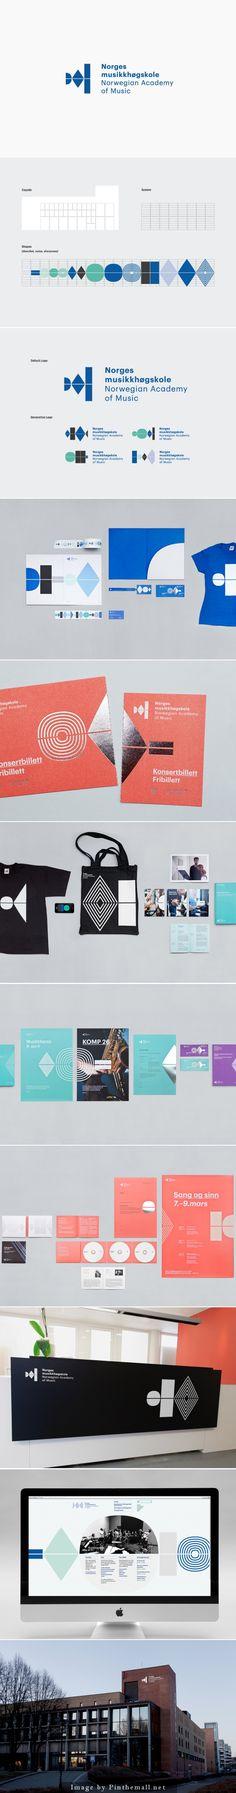 identity design, graphic, stationary, logo Norwegian Academy of Music _  Neue